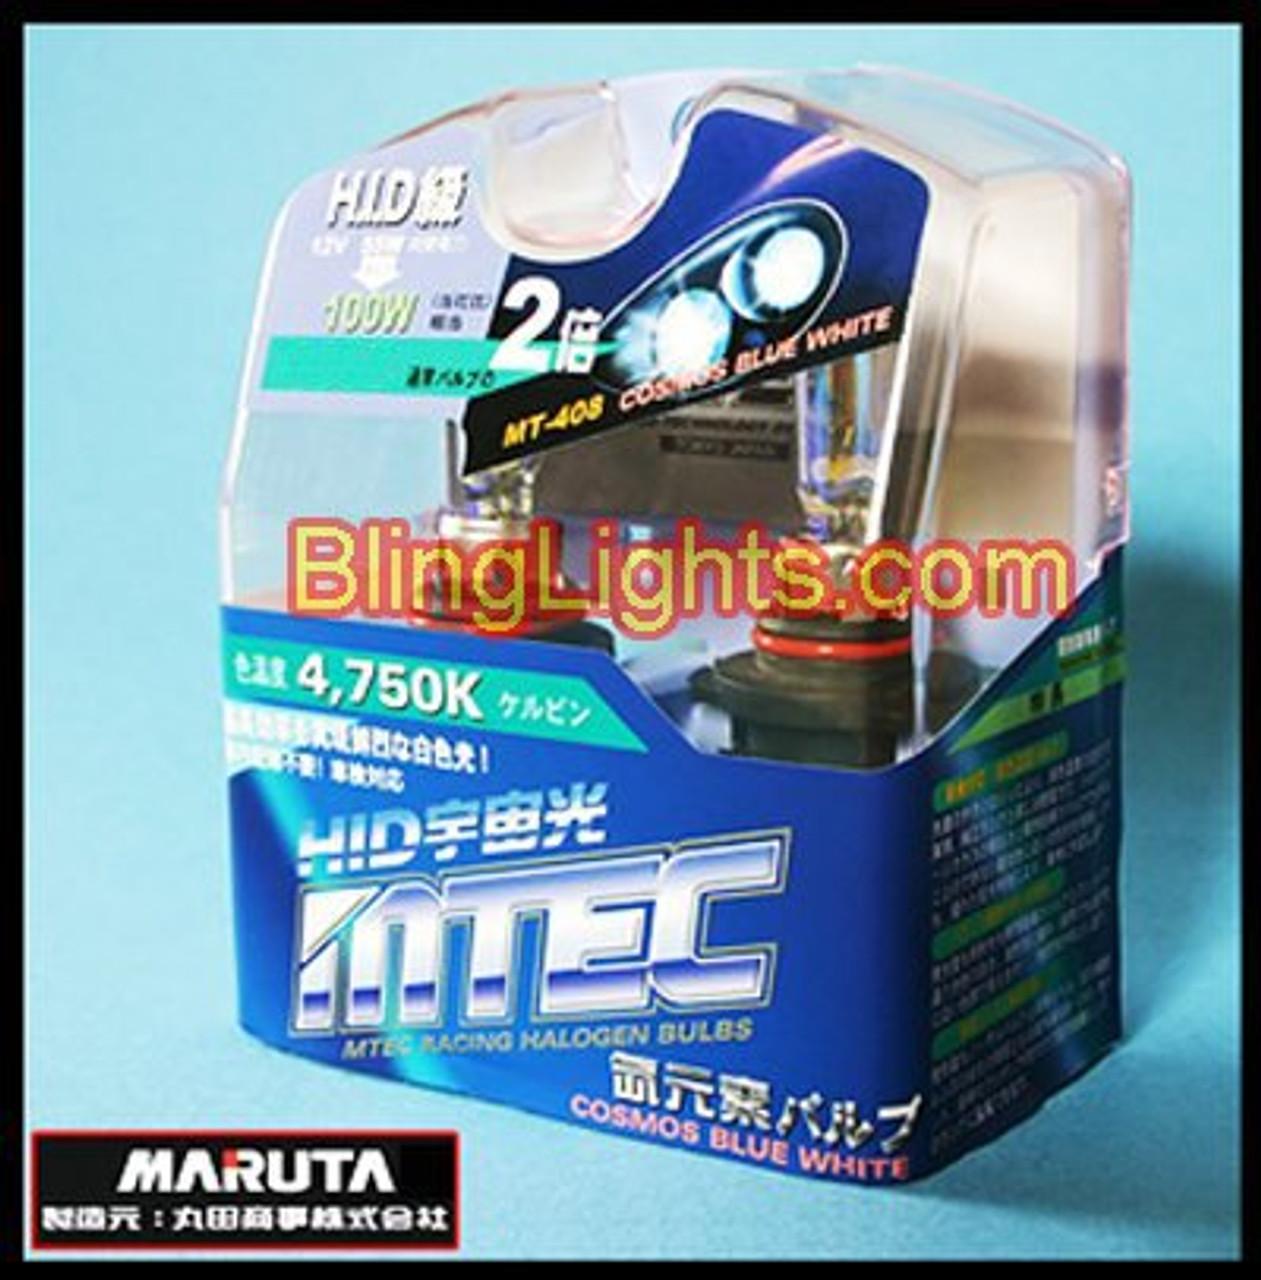 2000 2001 2002 2003 2004 2005 Hyundai Brio Bright White Light Bulbs for Headlamps Headlights